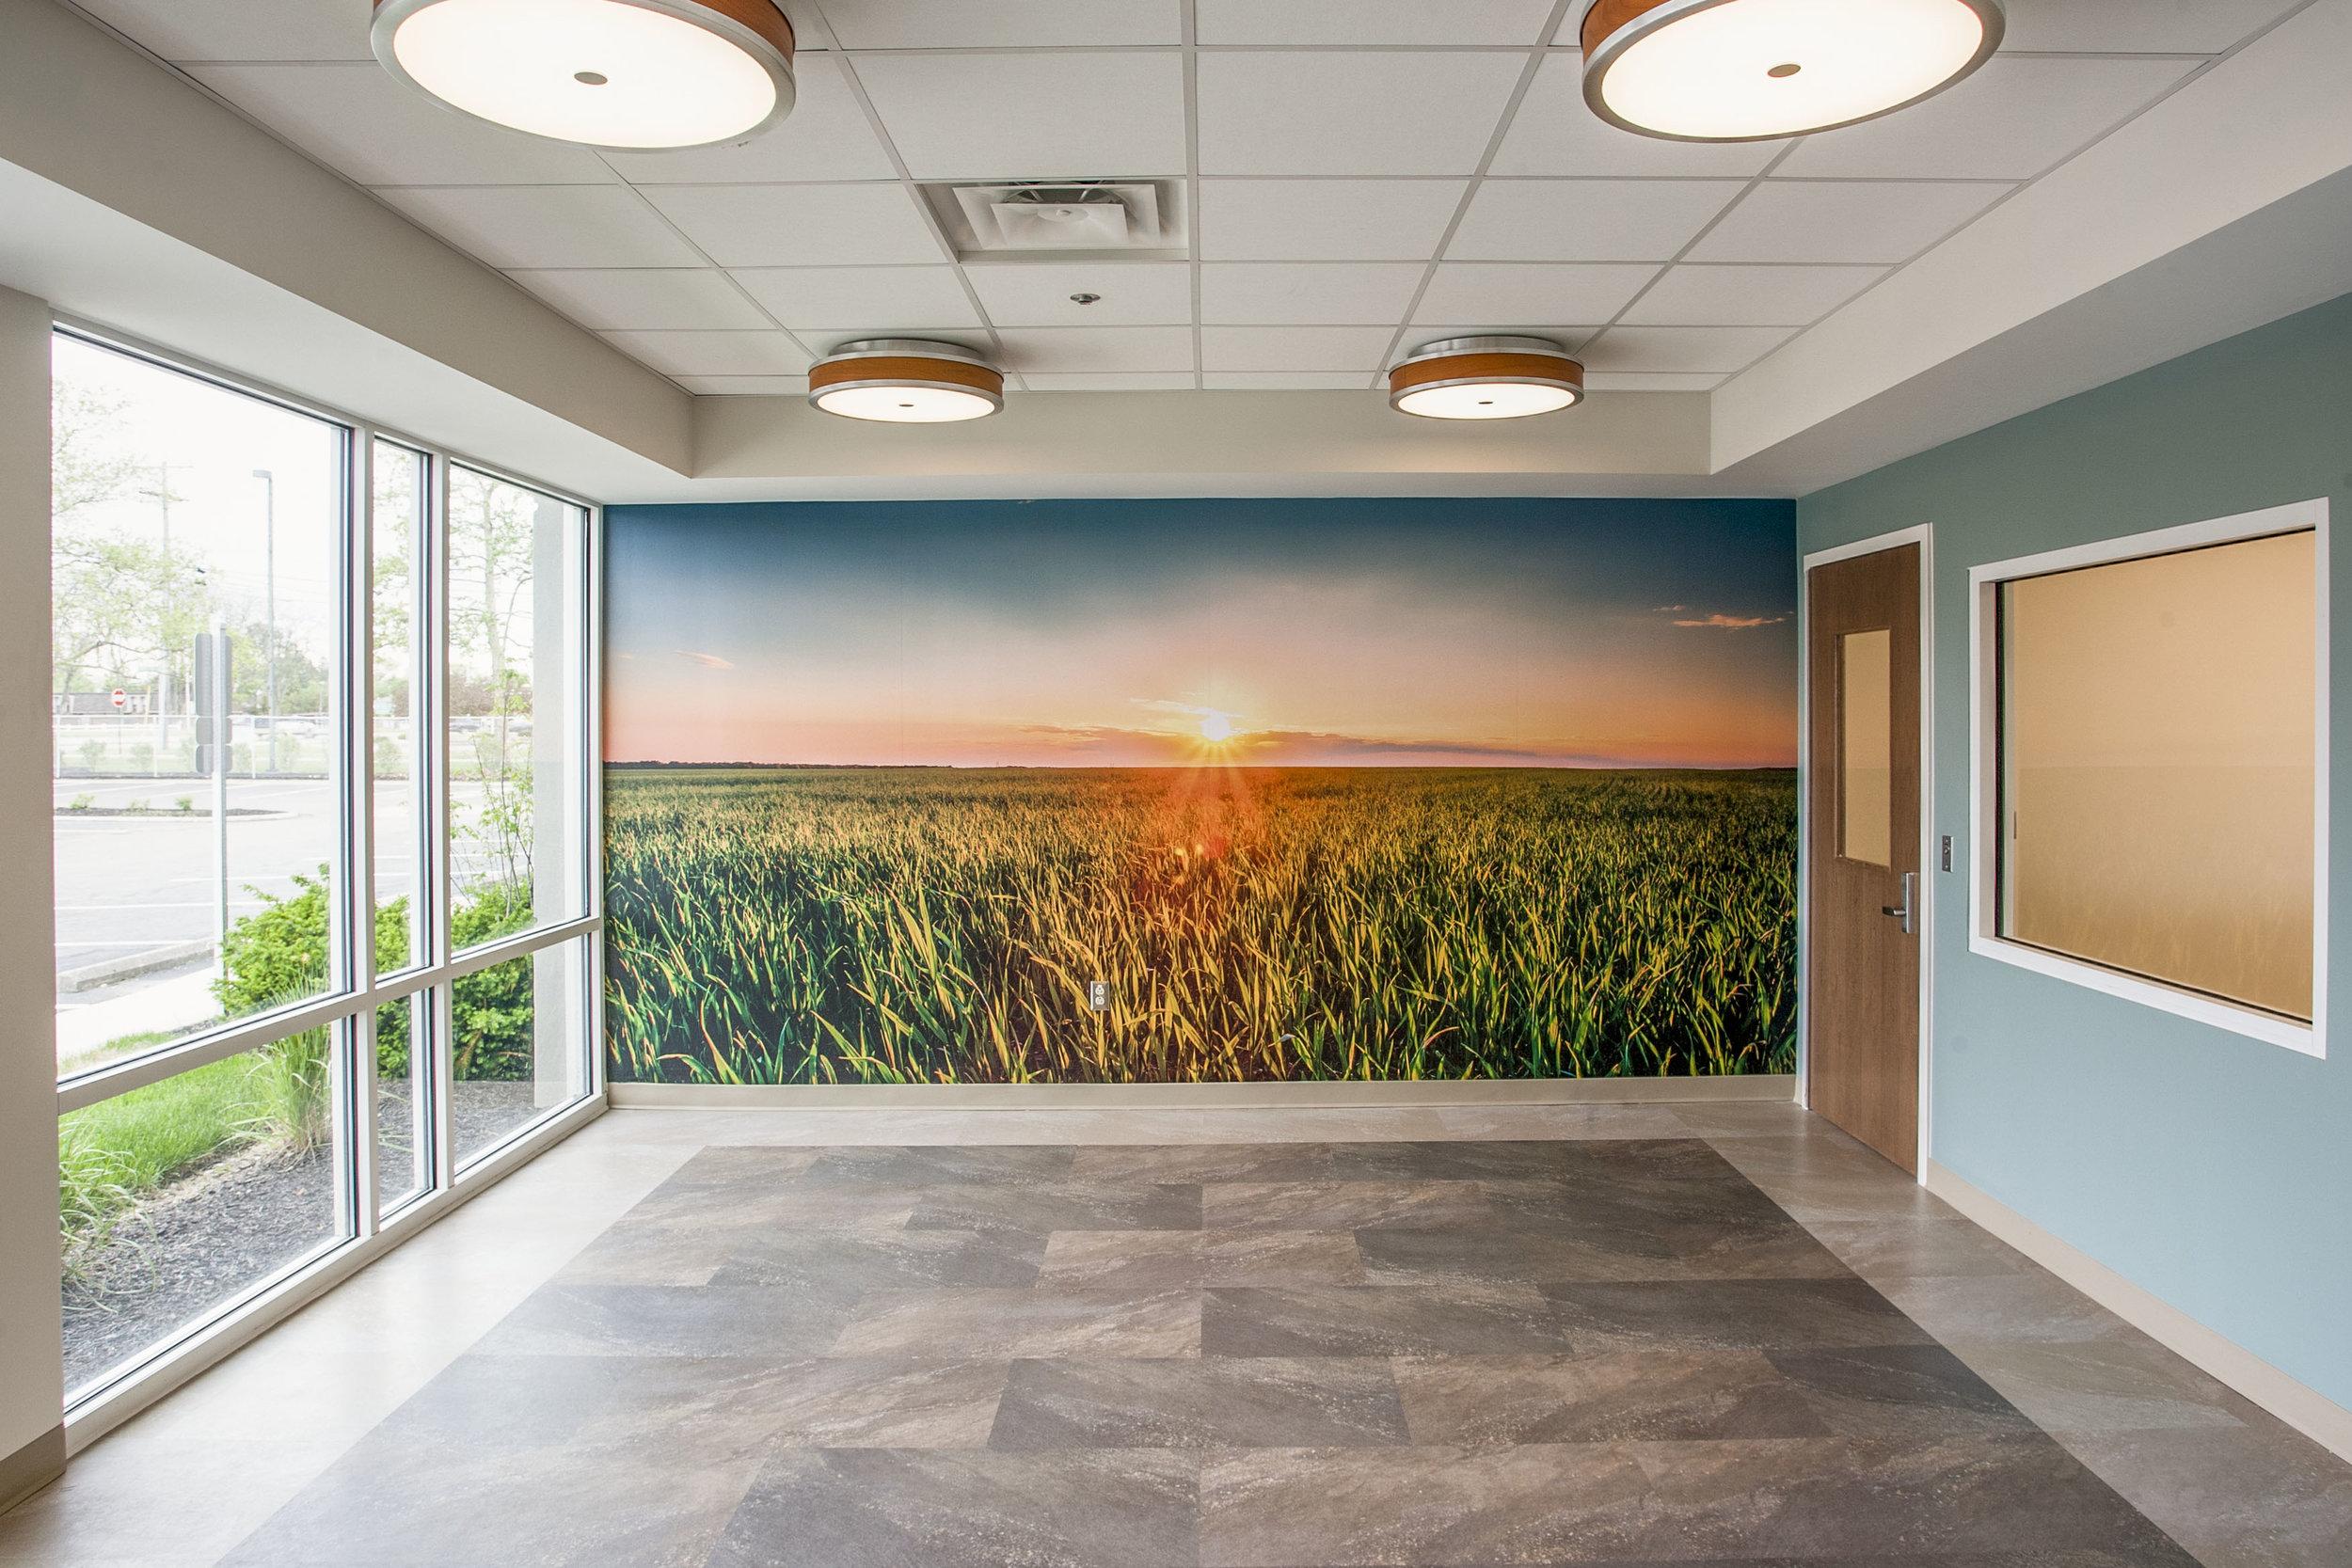 SUN Behavioral Health Inpatient Psychiatric Center